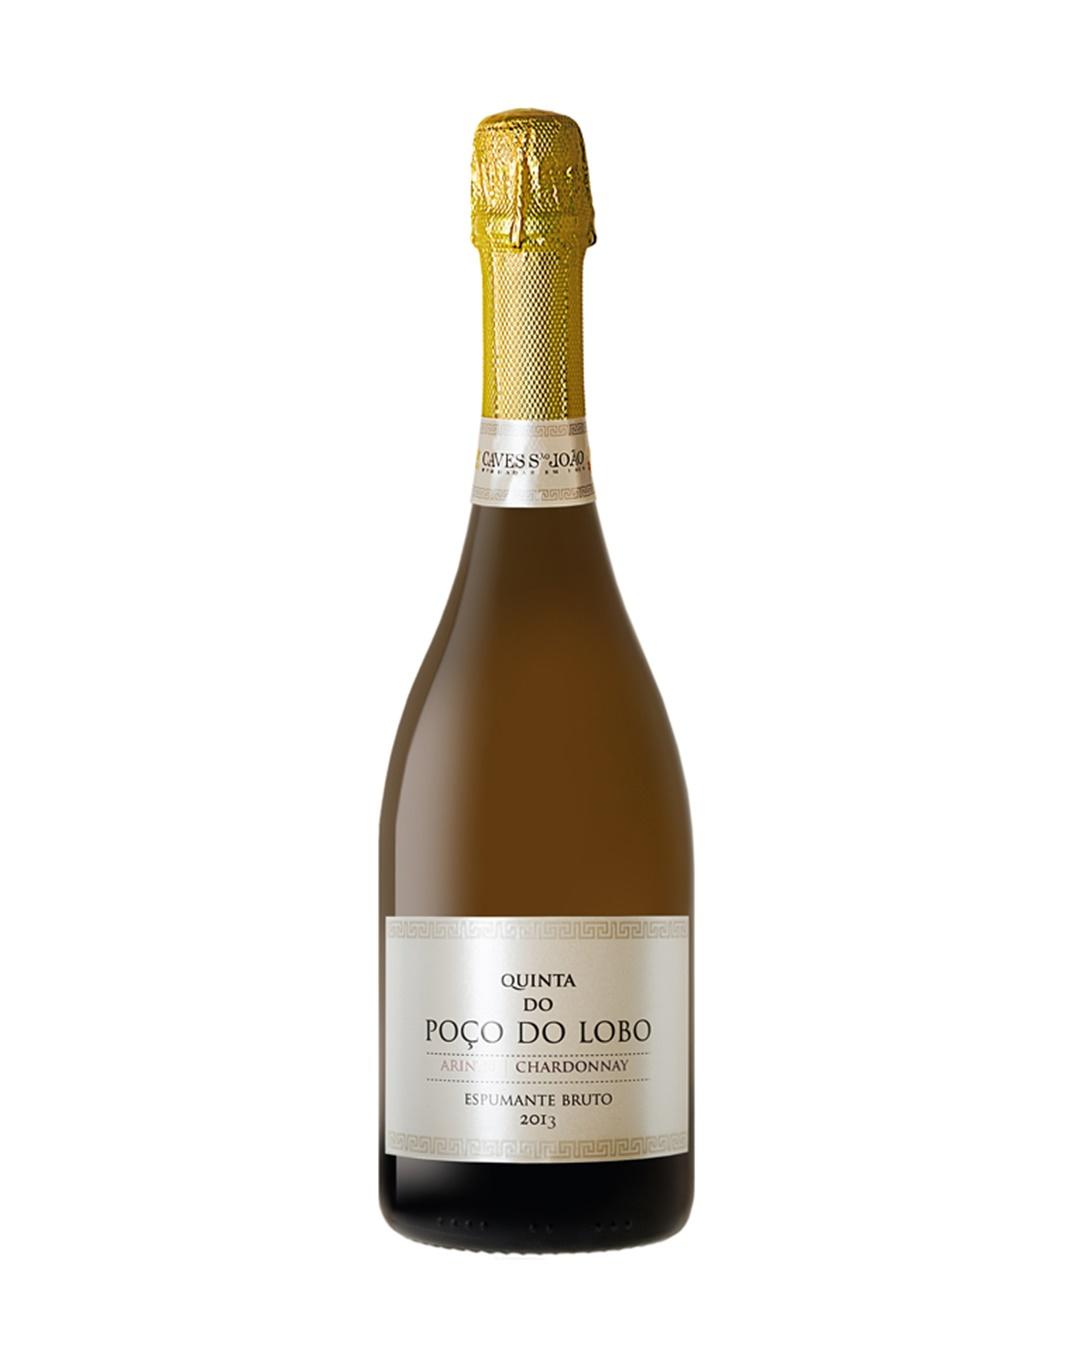 Quinta do Poço do Lobo Arinto & Chardonnay 2013